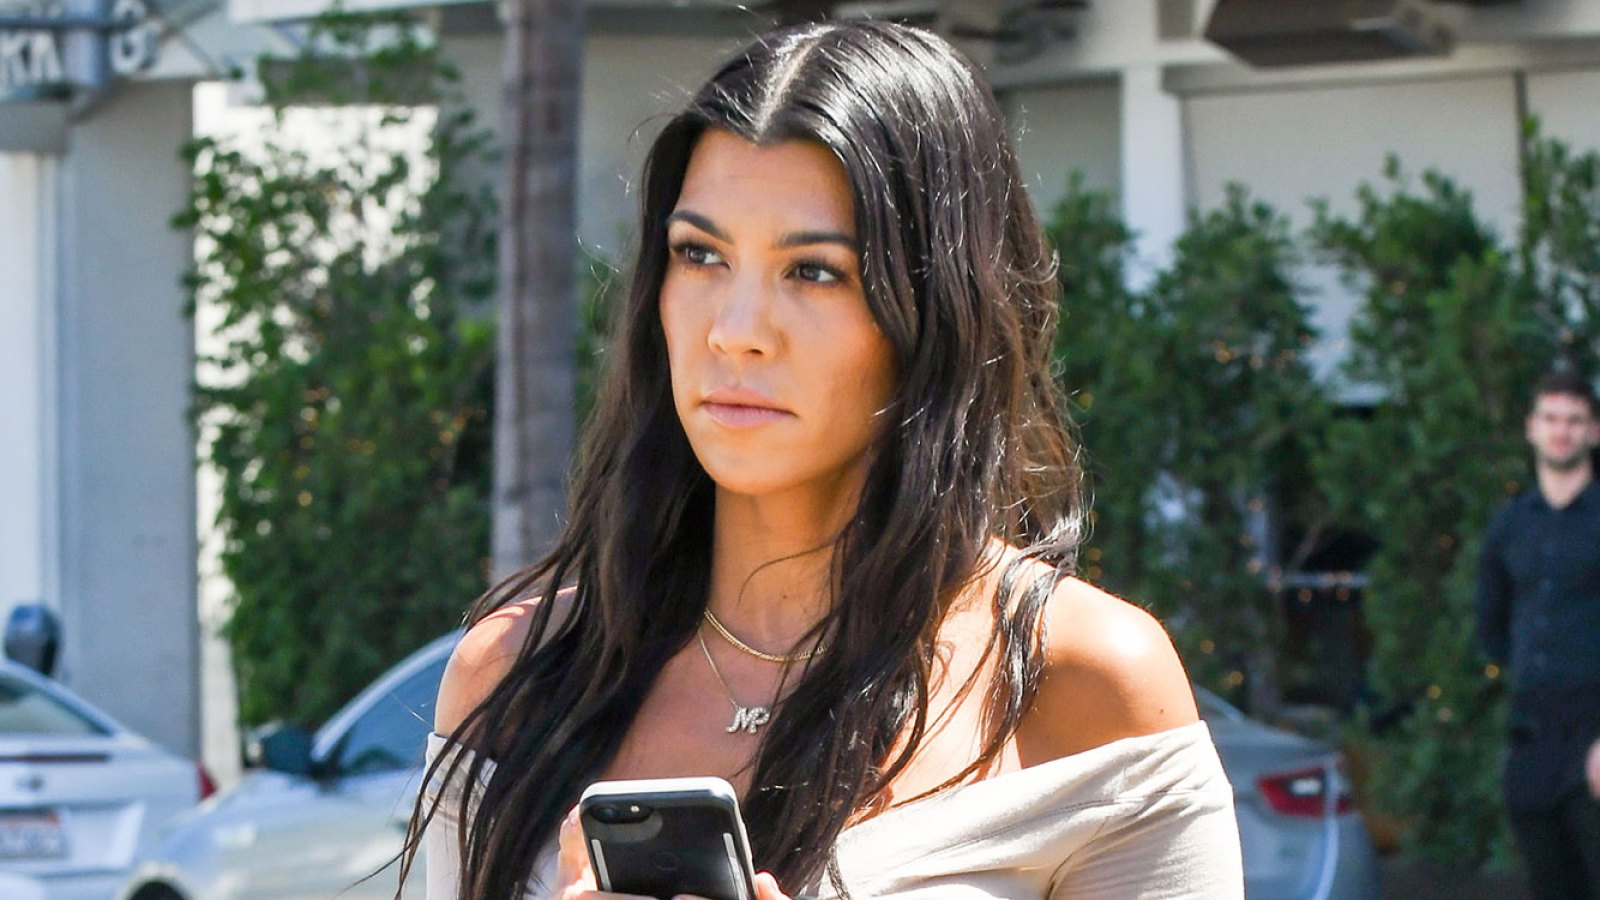 849cf2bcbb67a Kourtney Kardashian Seemingly Shades Kim With Fan Diss Track   No One  Recognizes Kim Until She s Undressed